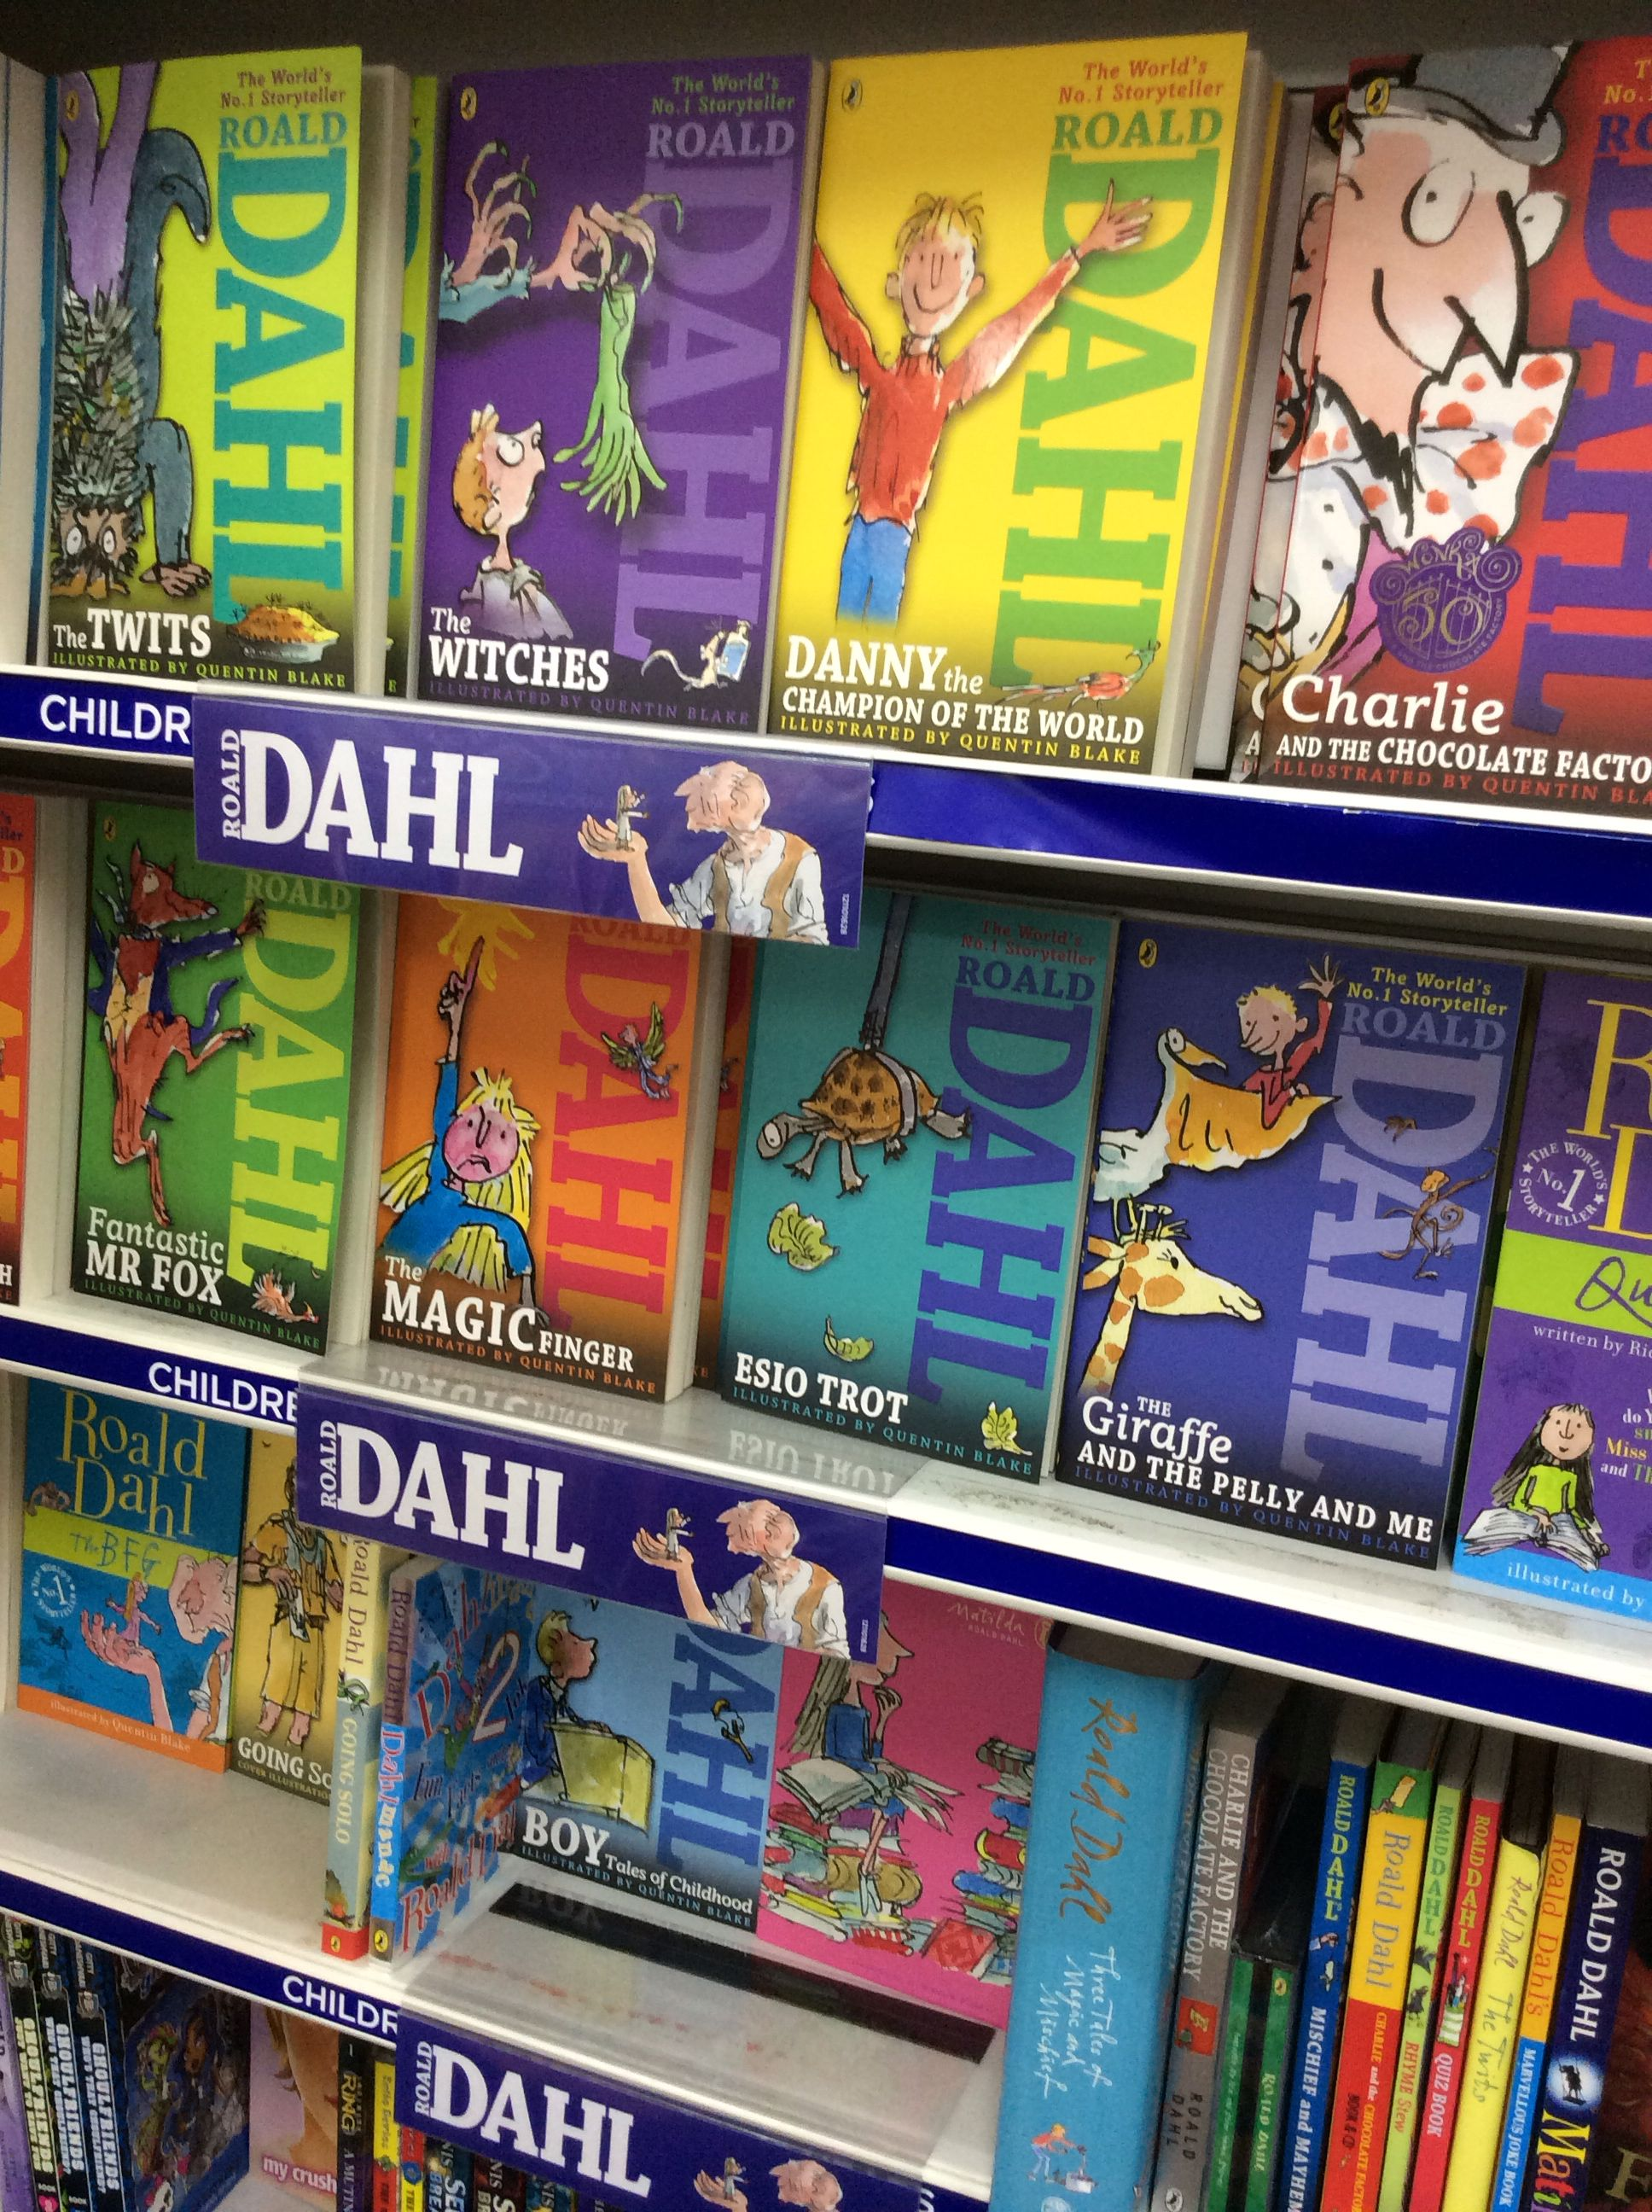 Roald Dahl Dahl Mister Fantastic